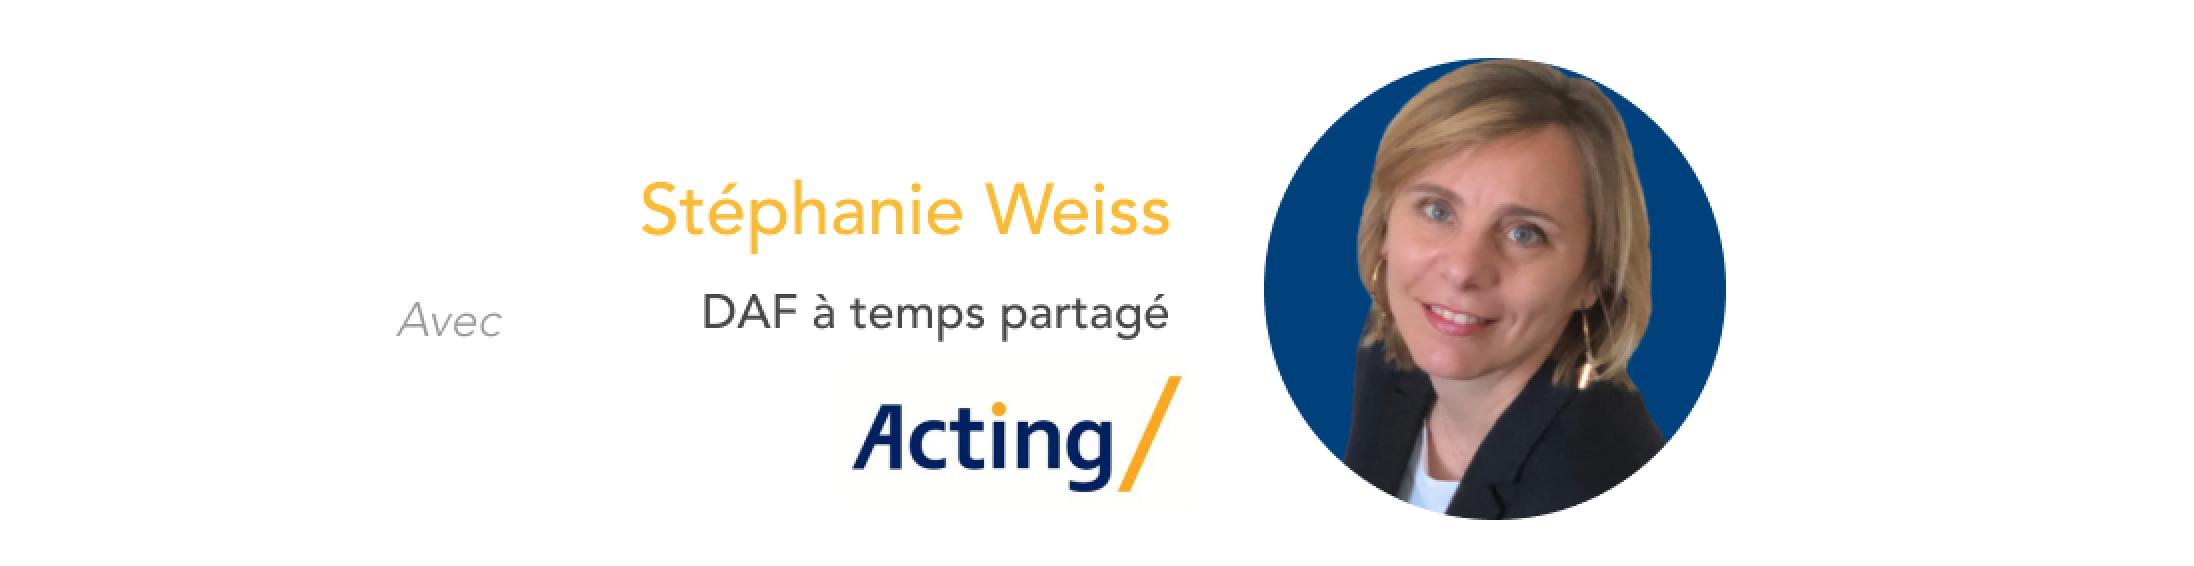 Stéphanie Weiss Cash Academy épisode 4